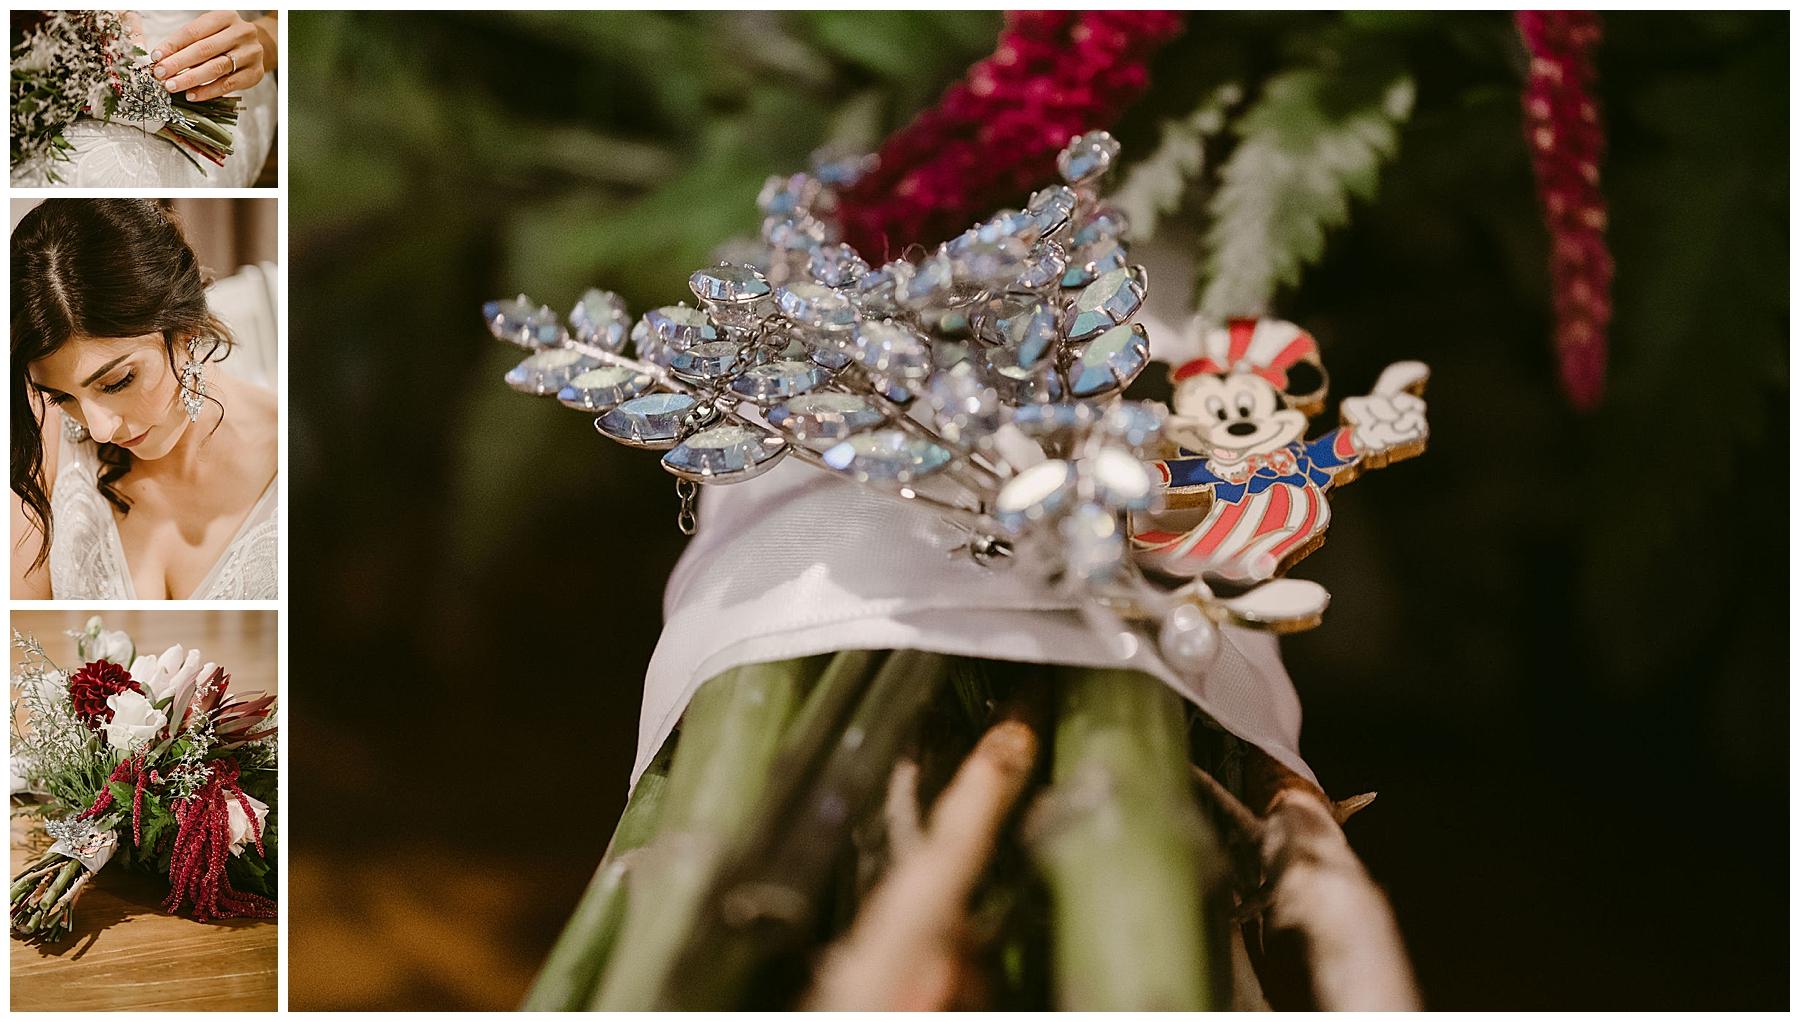 Adam's Peak Wedding Photos + Popcorn Photography_0008.jpg